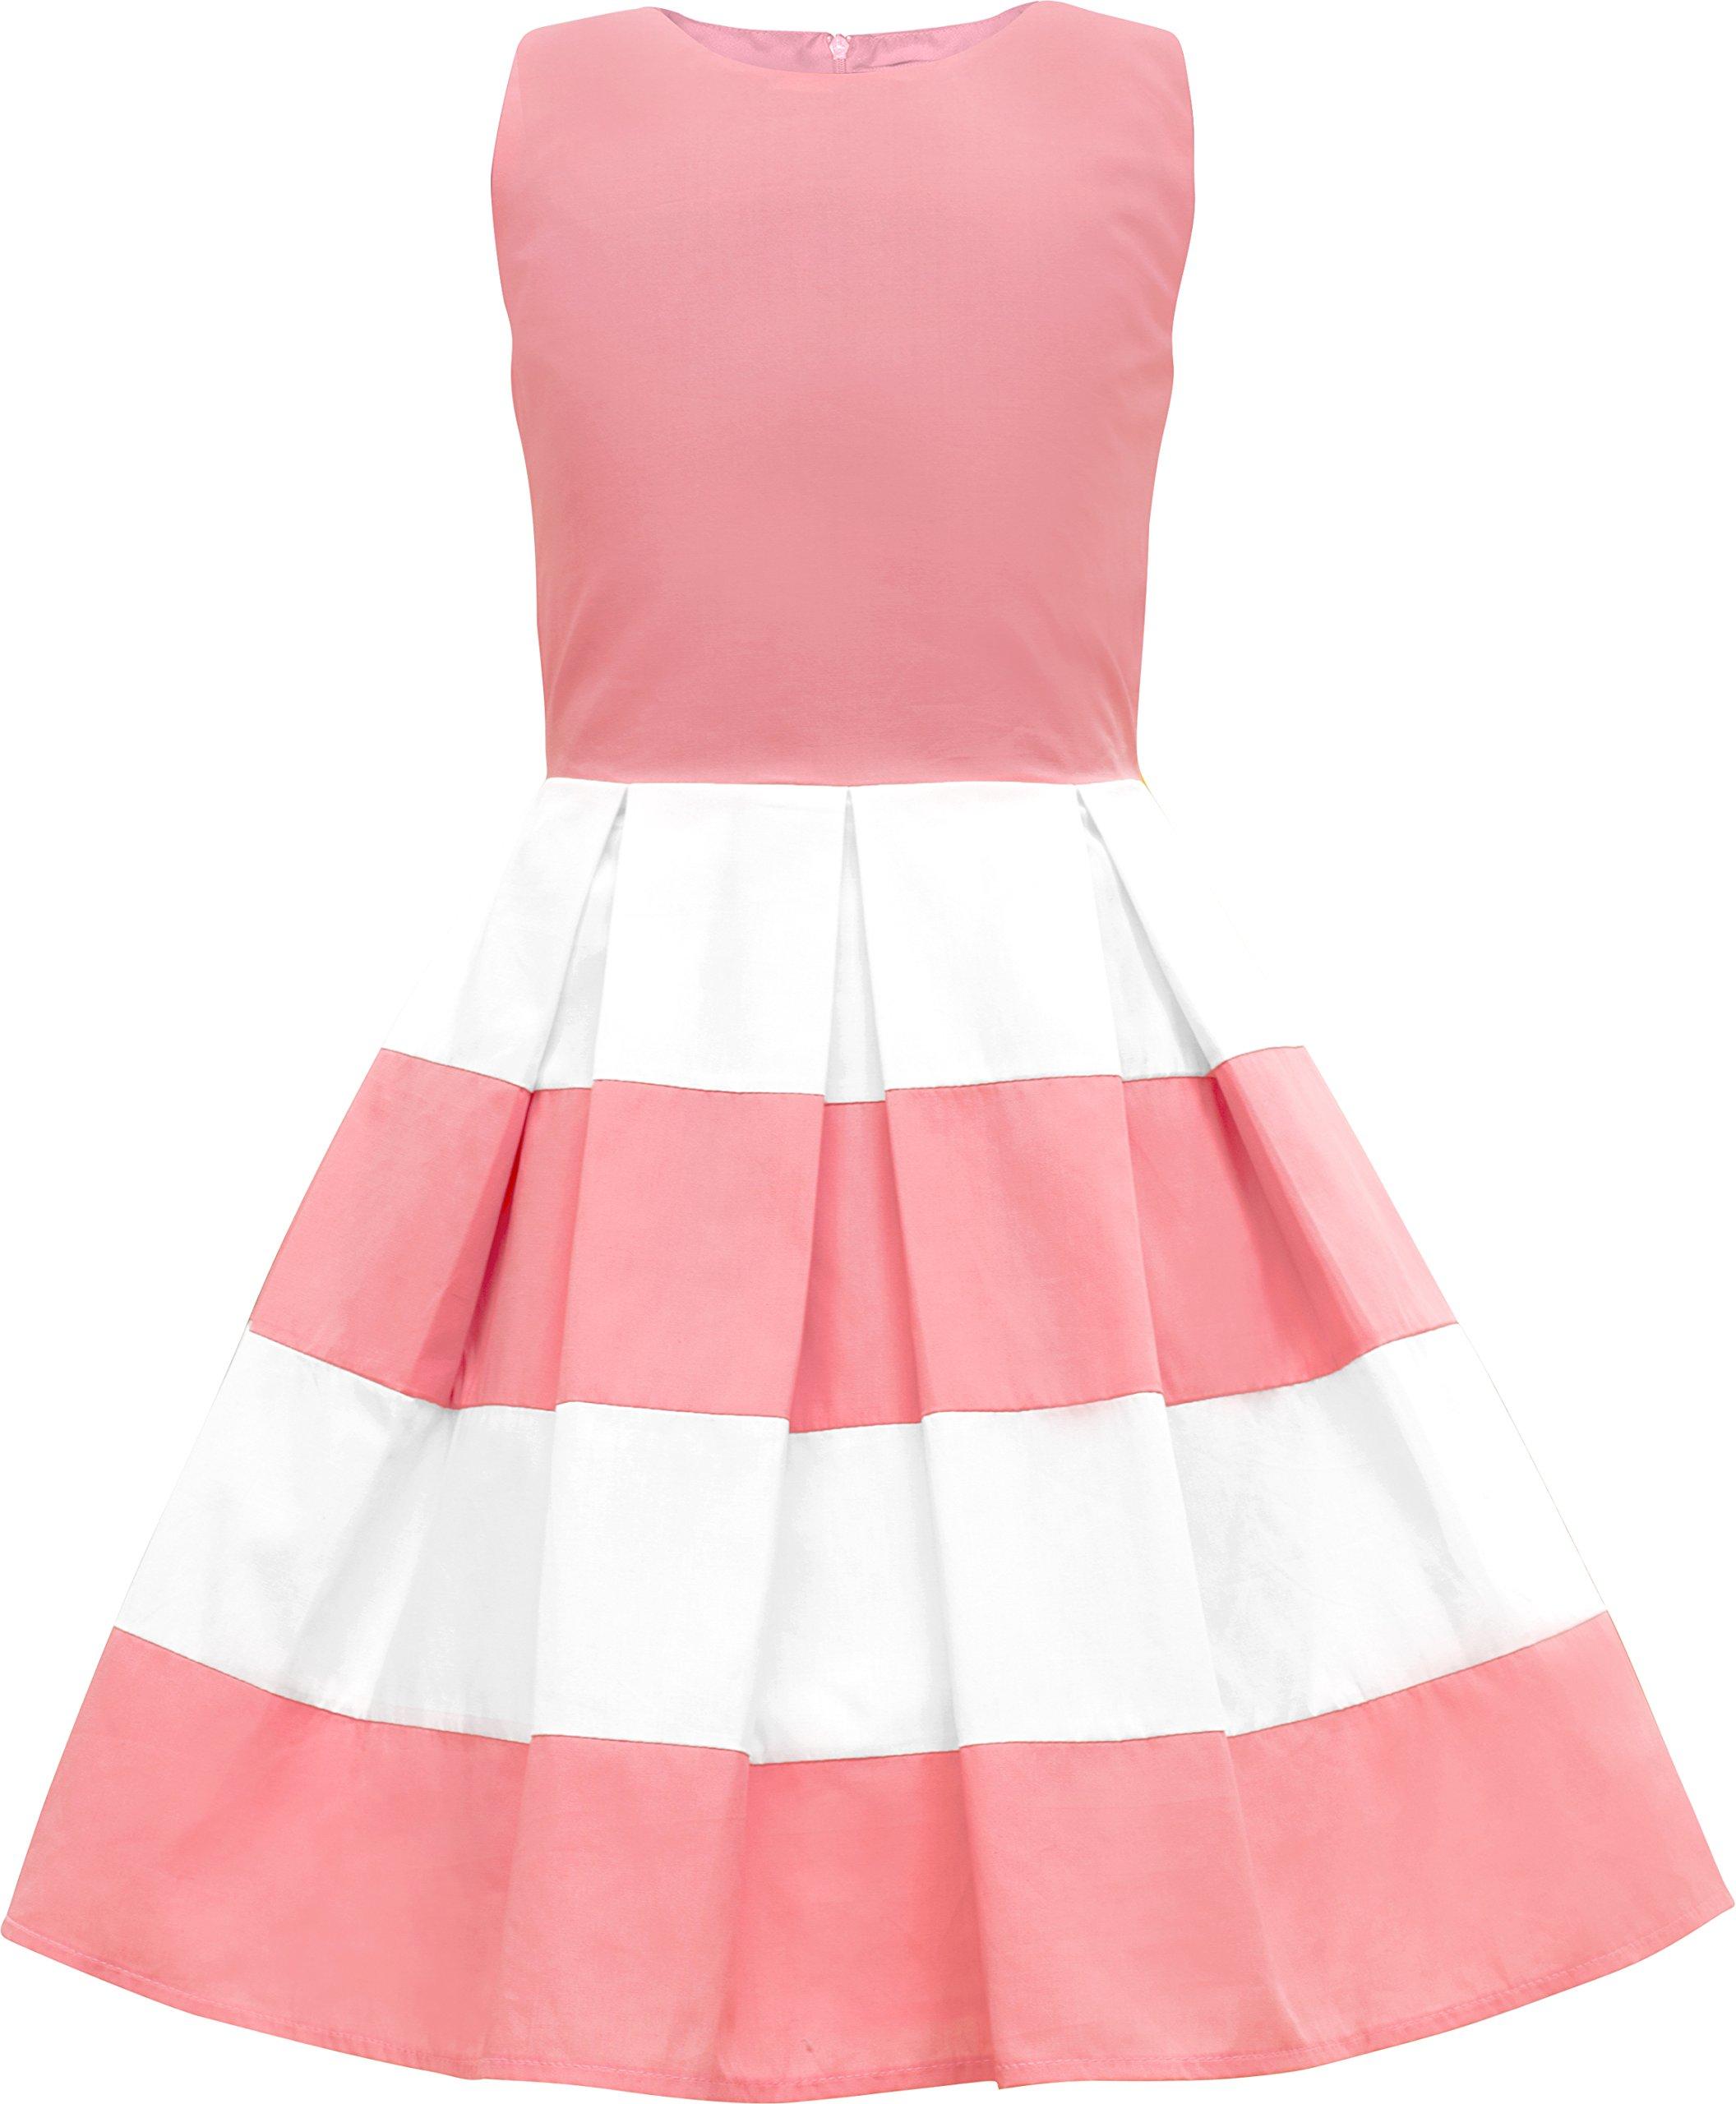 fe21ecf23 BlackButterfly Kids 'Lilly' Vintage Striped 50's Children's Girls Dress  (Pink, 9-10 YRS)